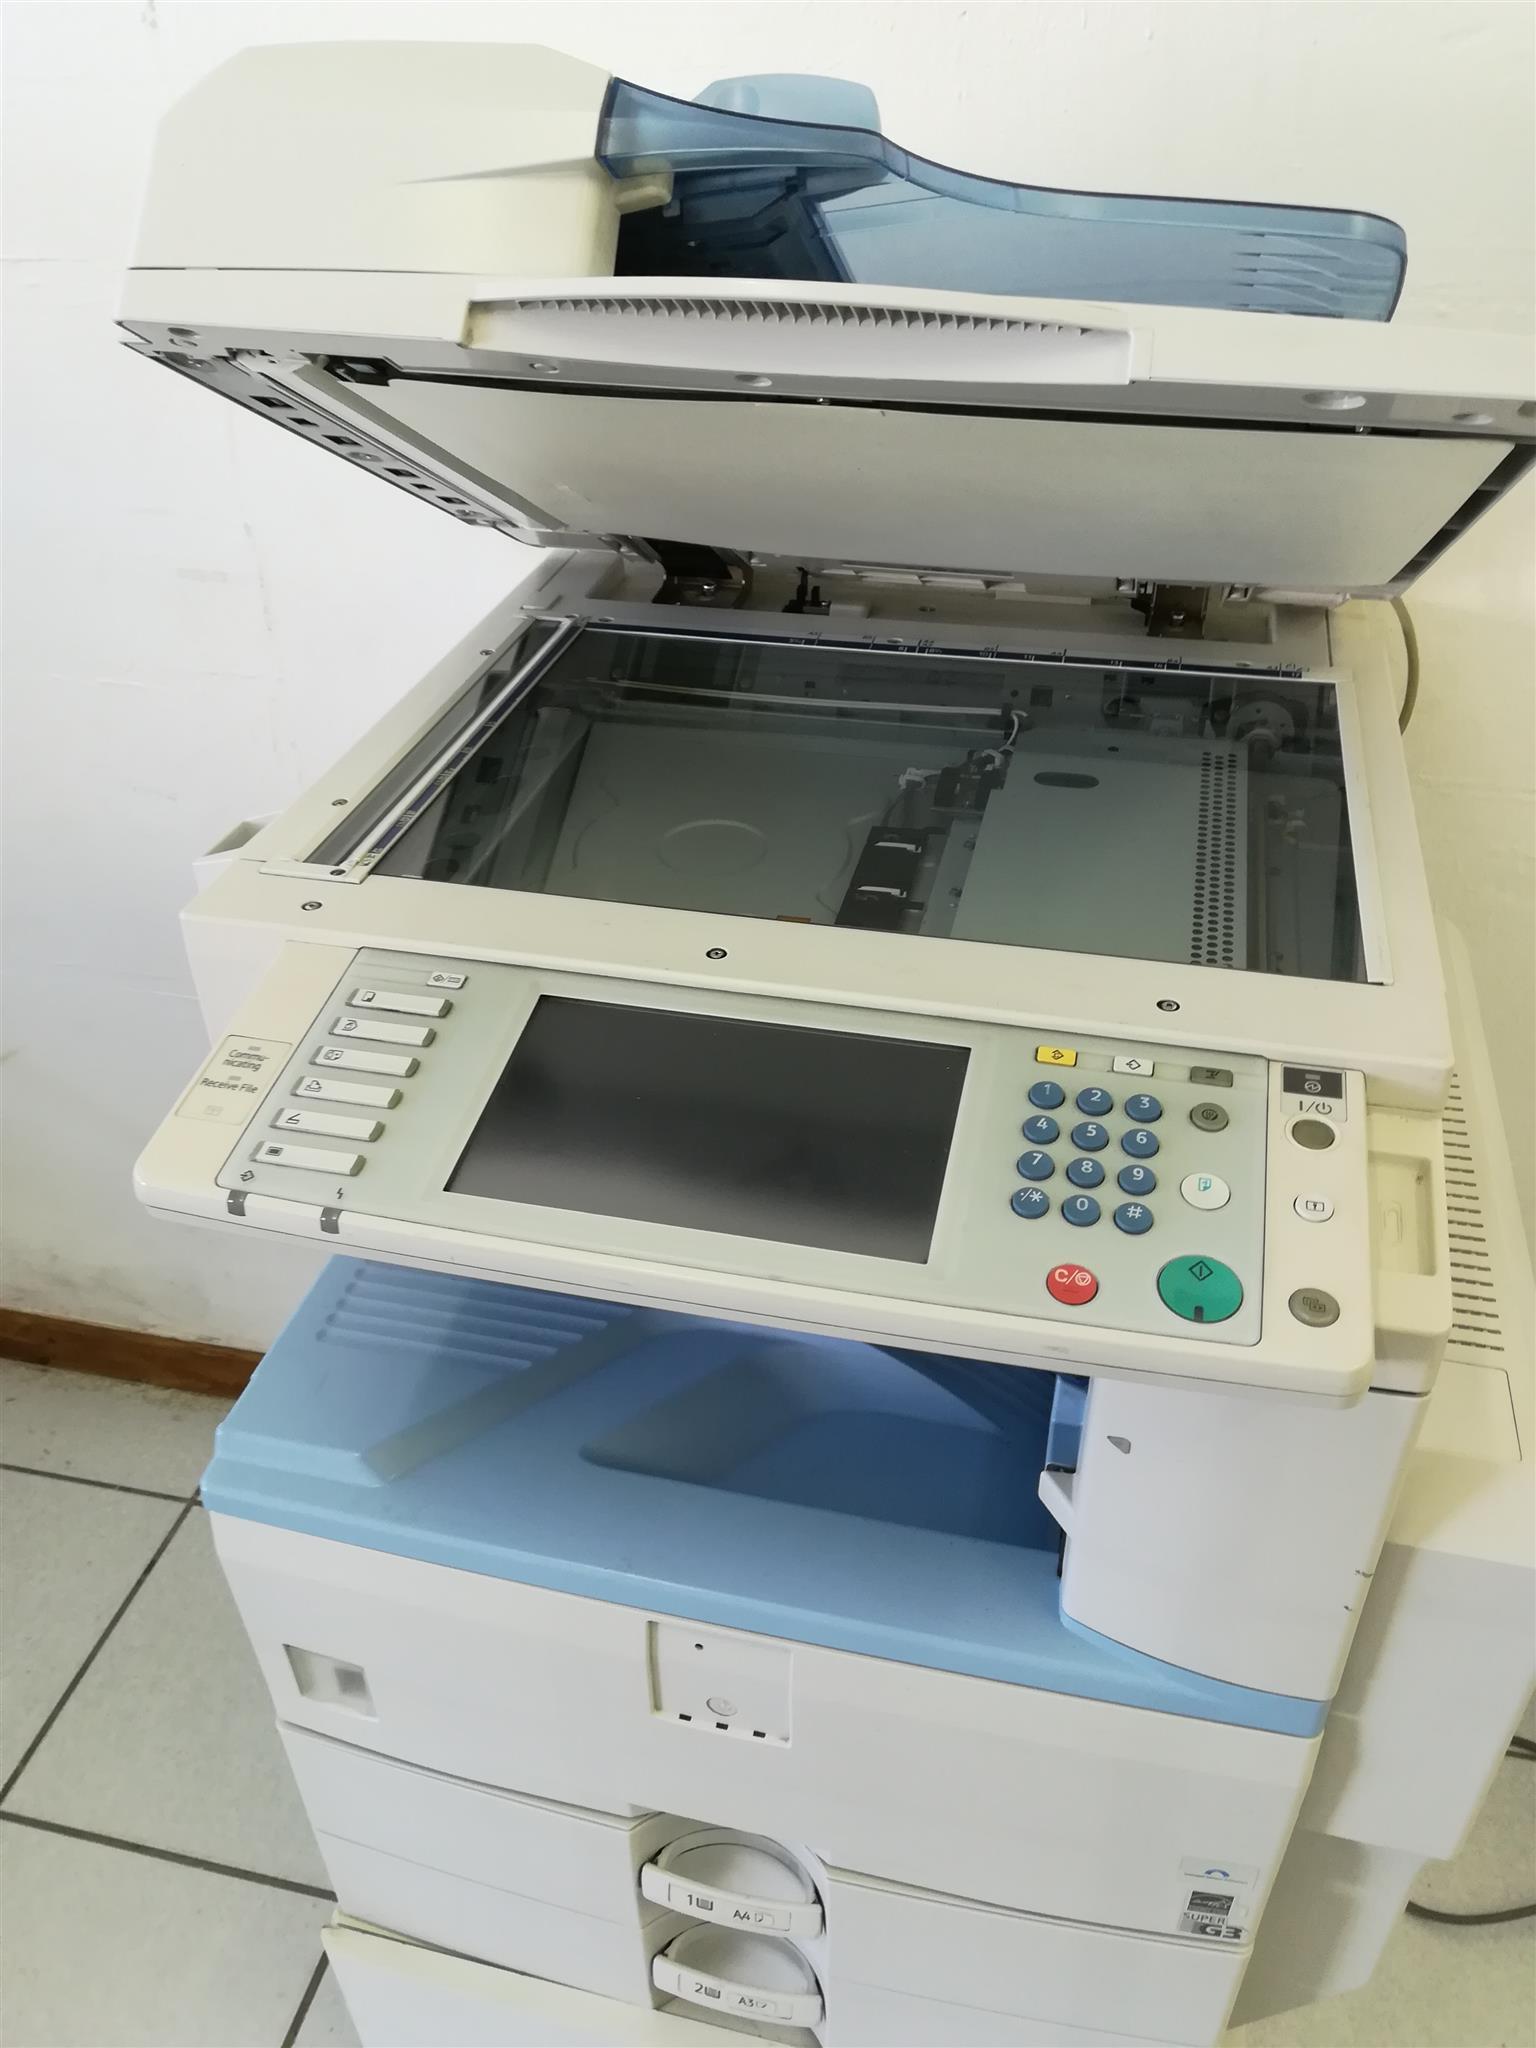 MP2851  Nashua Printer